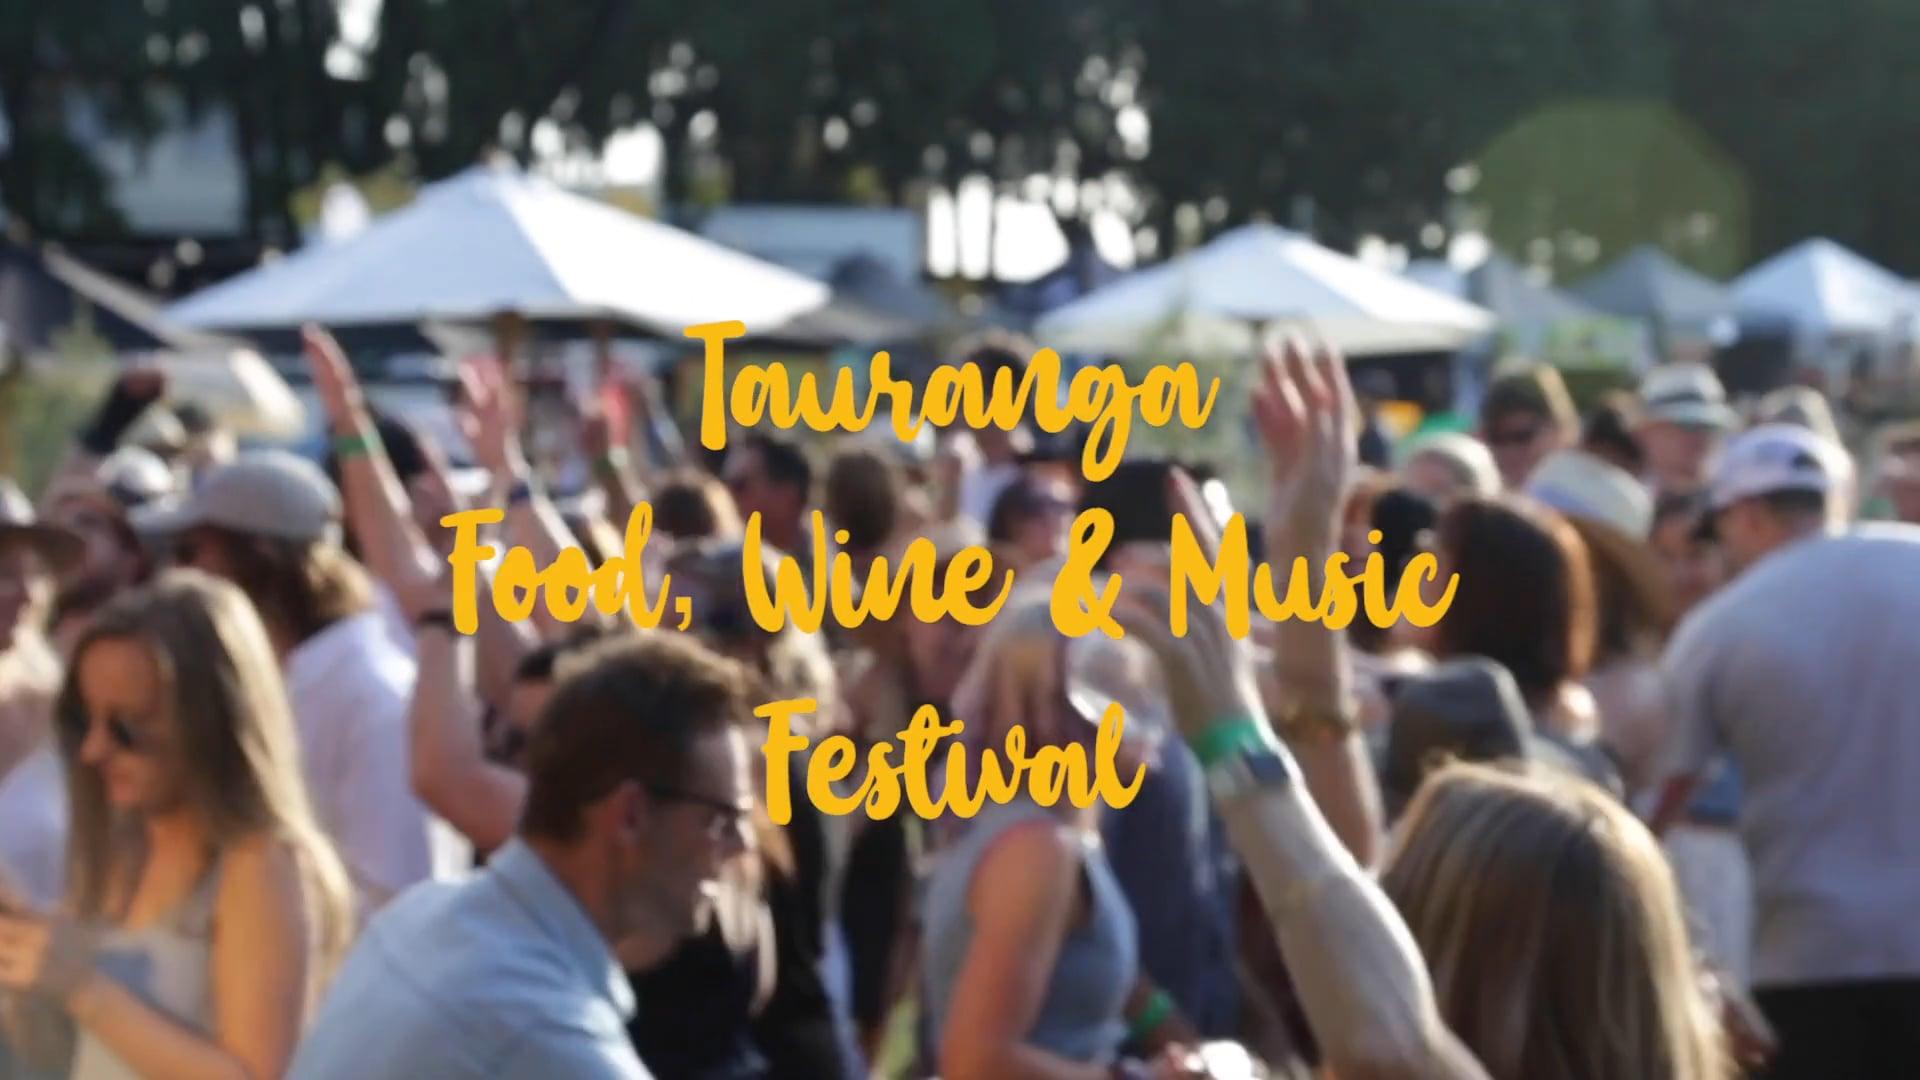 Video Production for Tauranga Food, Wine & Music Festival